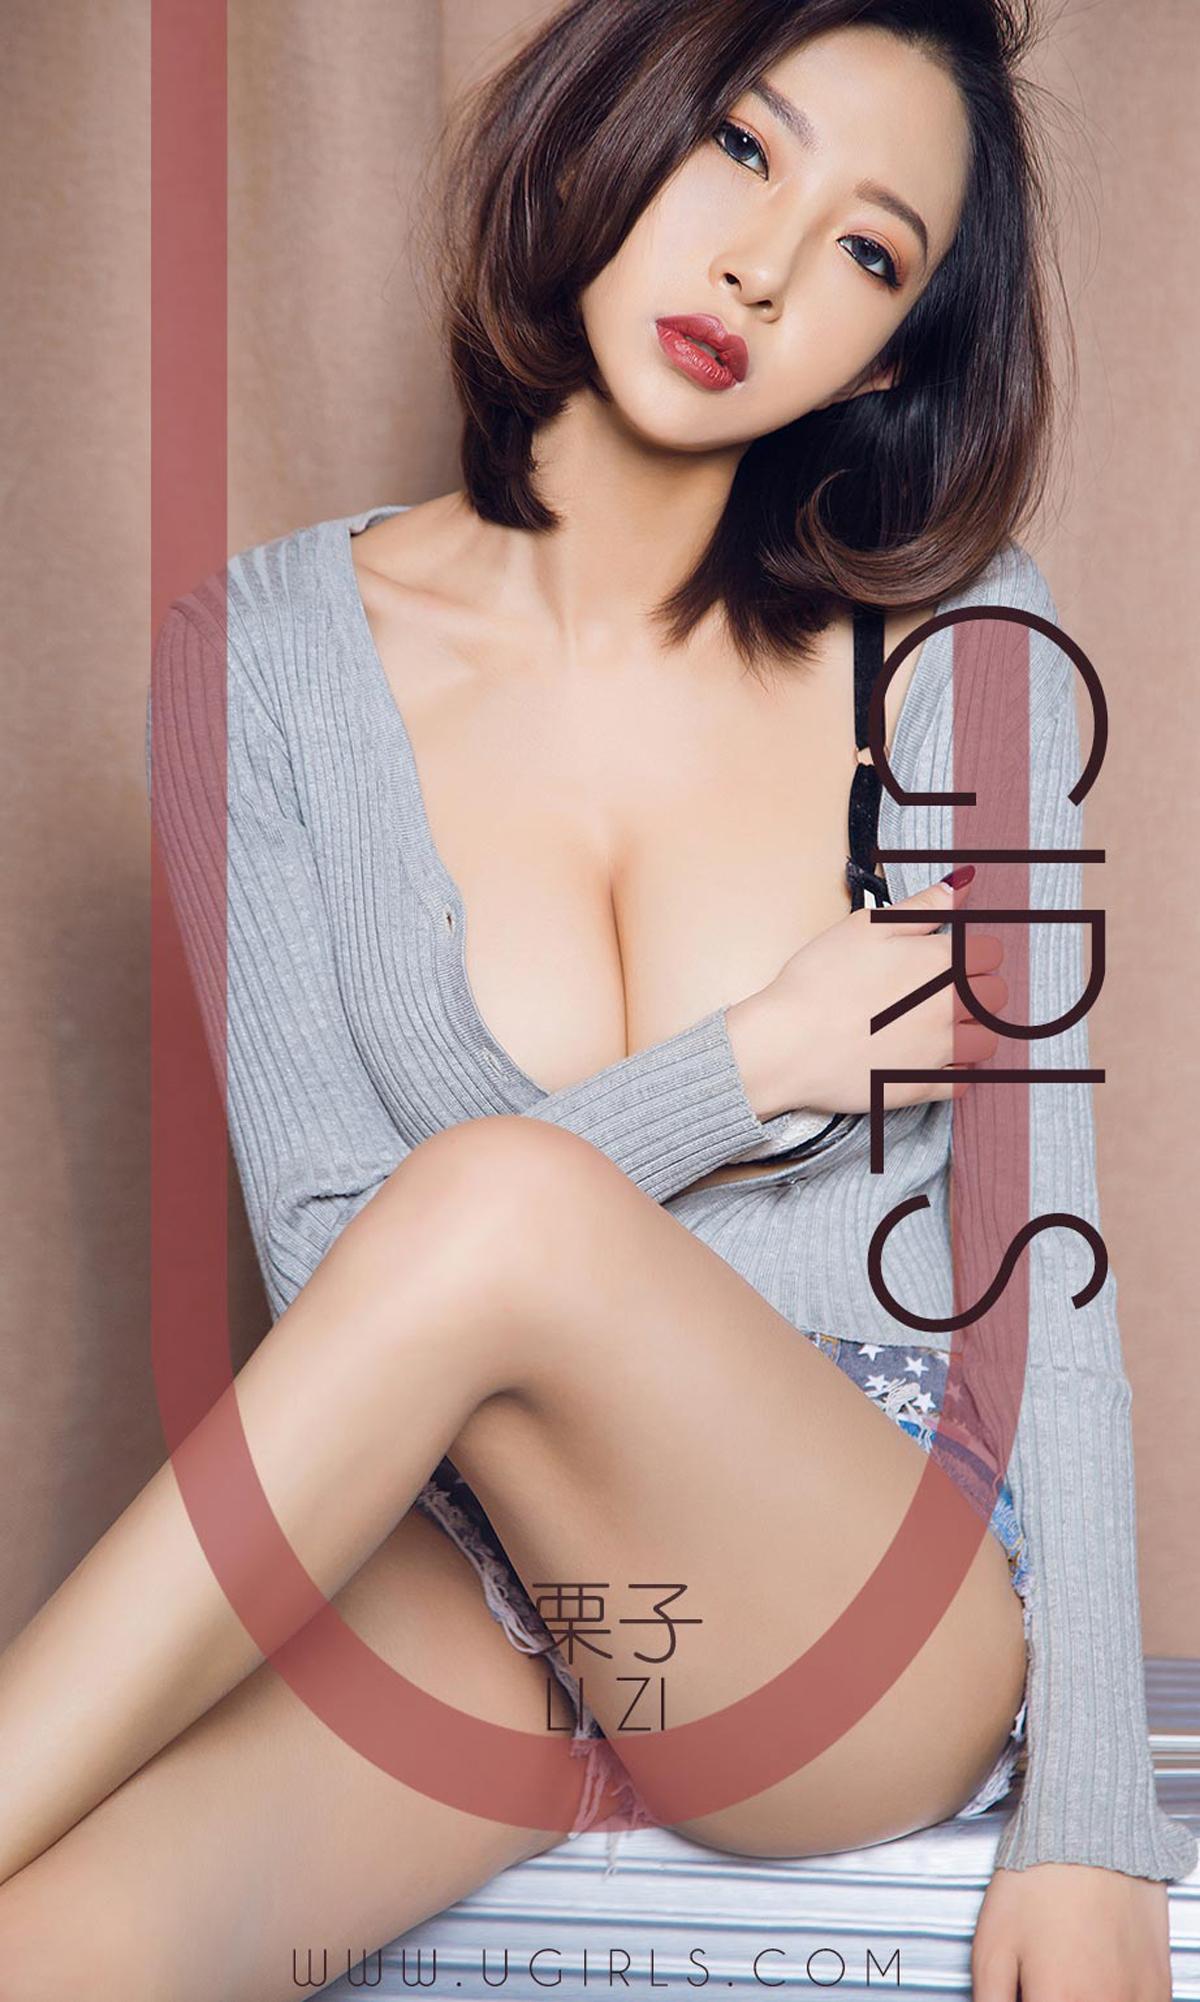 [Ugirls]爱尤物 No.1353 着迷 栗子 [35P